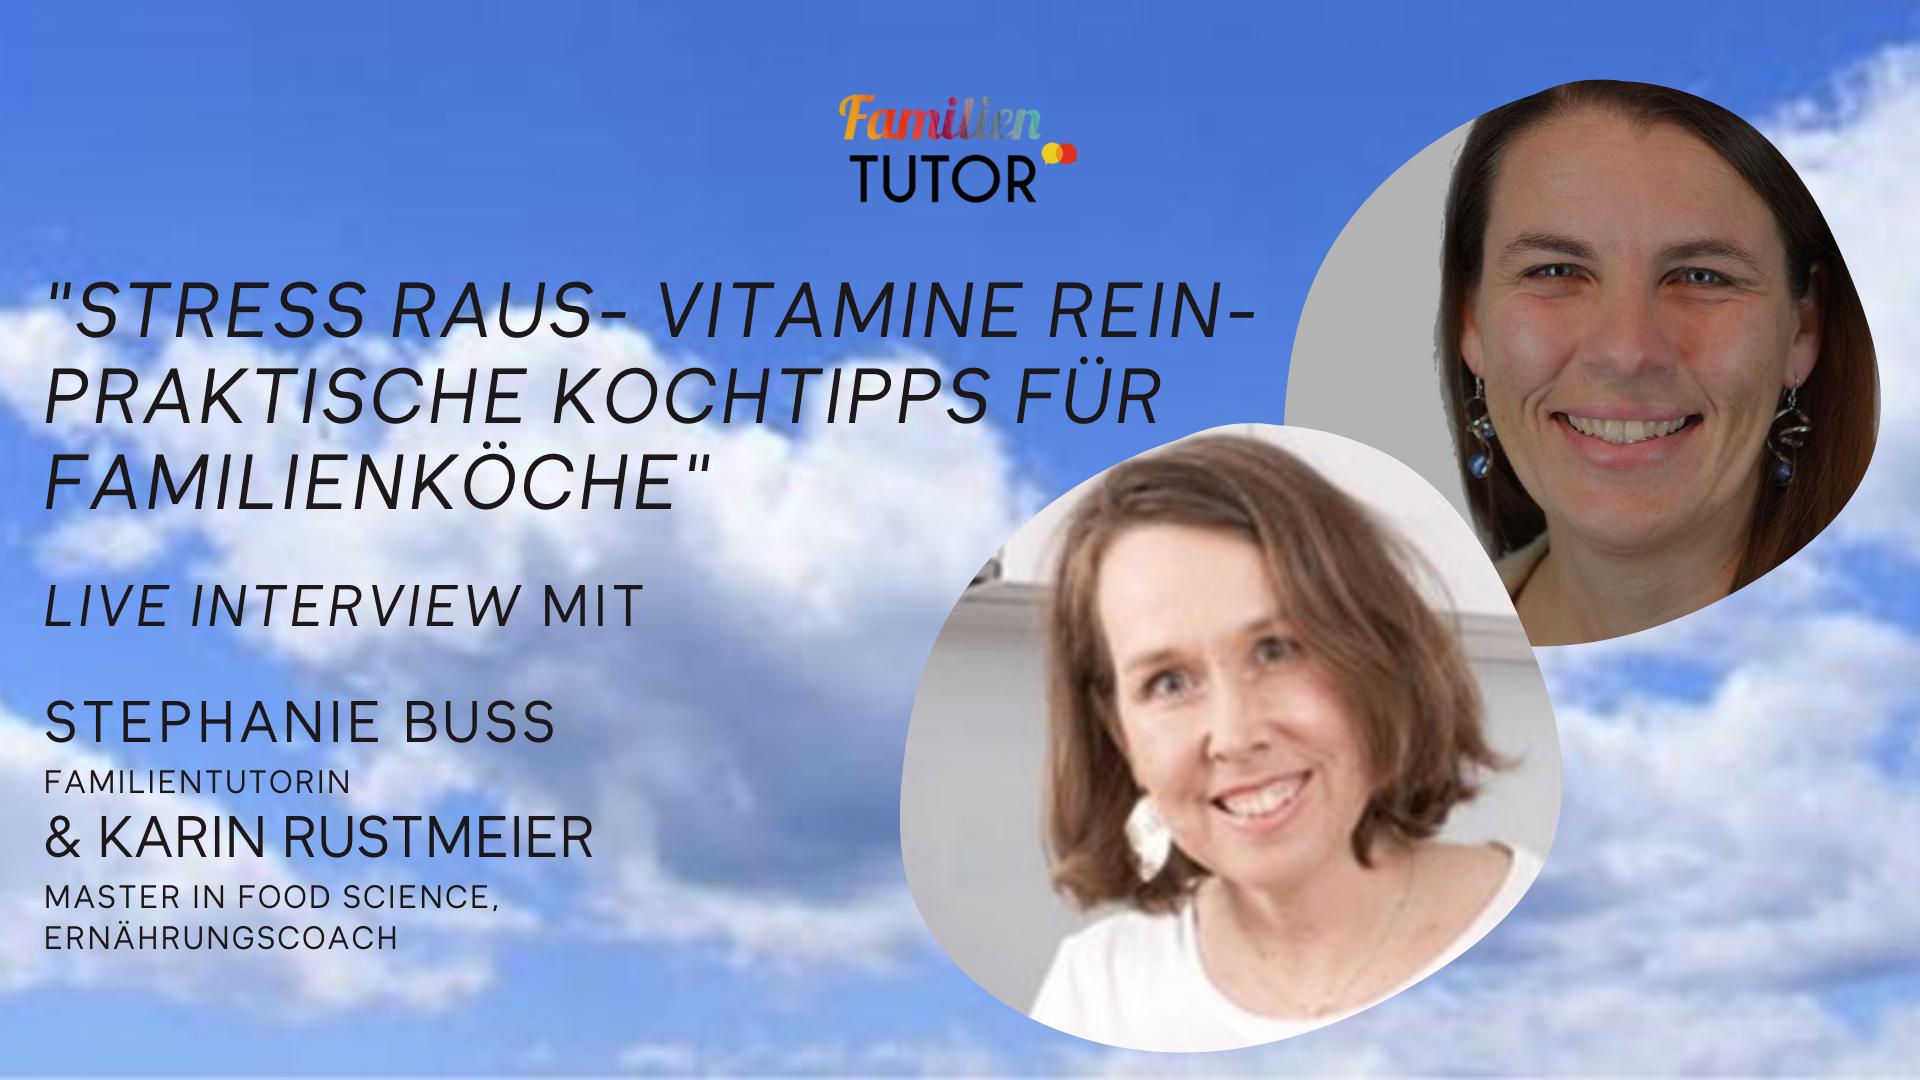 Family Friday Tutorial mit Karin Rustmeier